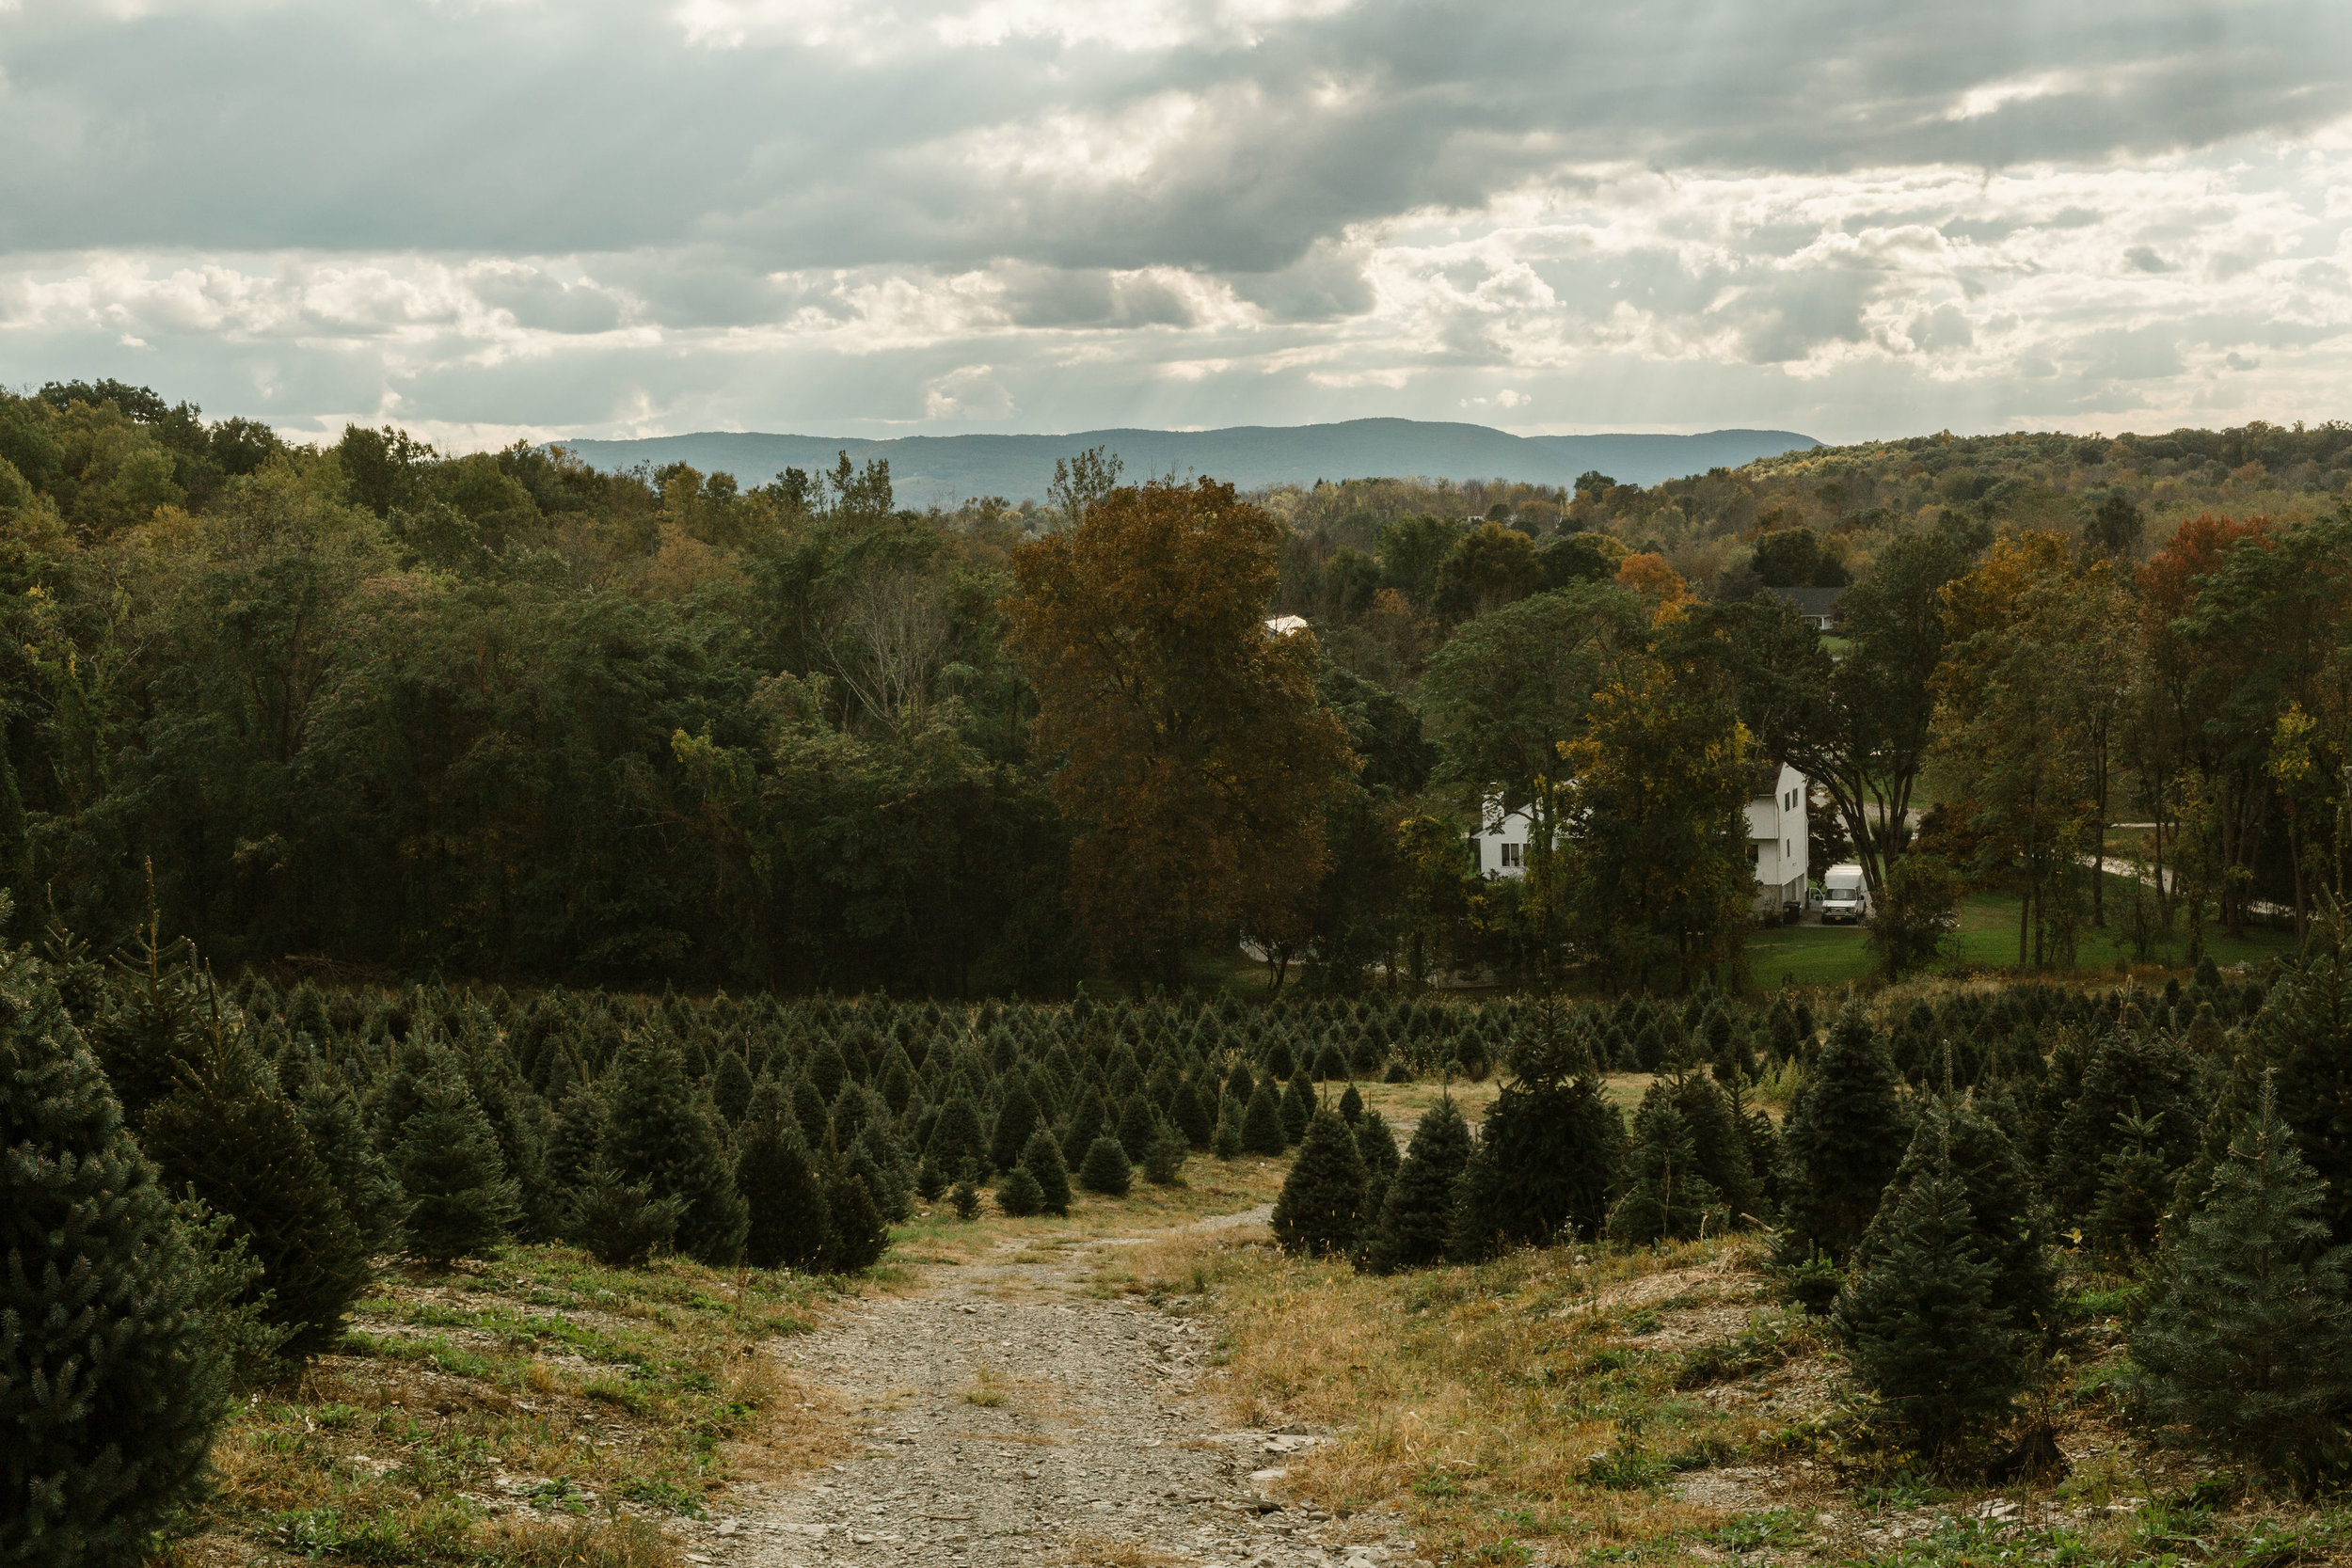 young-love-media-rustic-fall-autumn-wedding-emmerich-tree-farm-hudson-valley-warwick-new-york-getting-ready-179.jpg